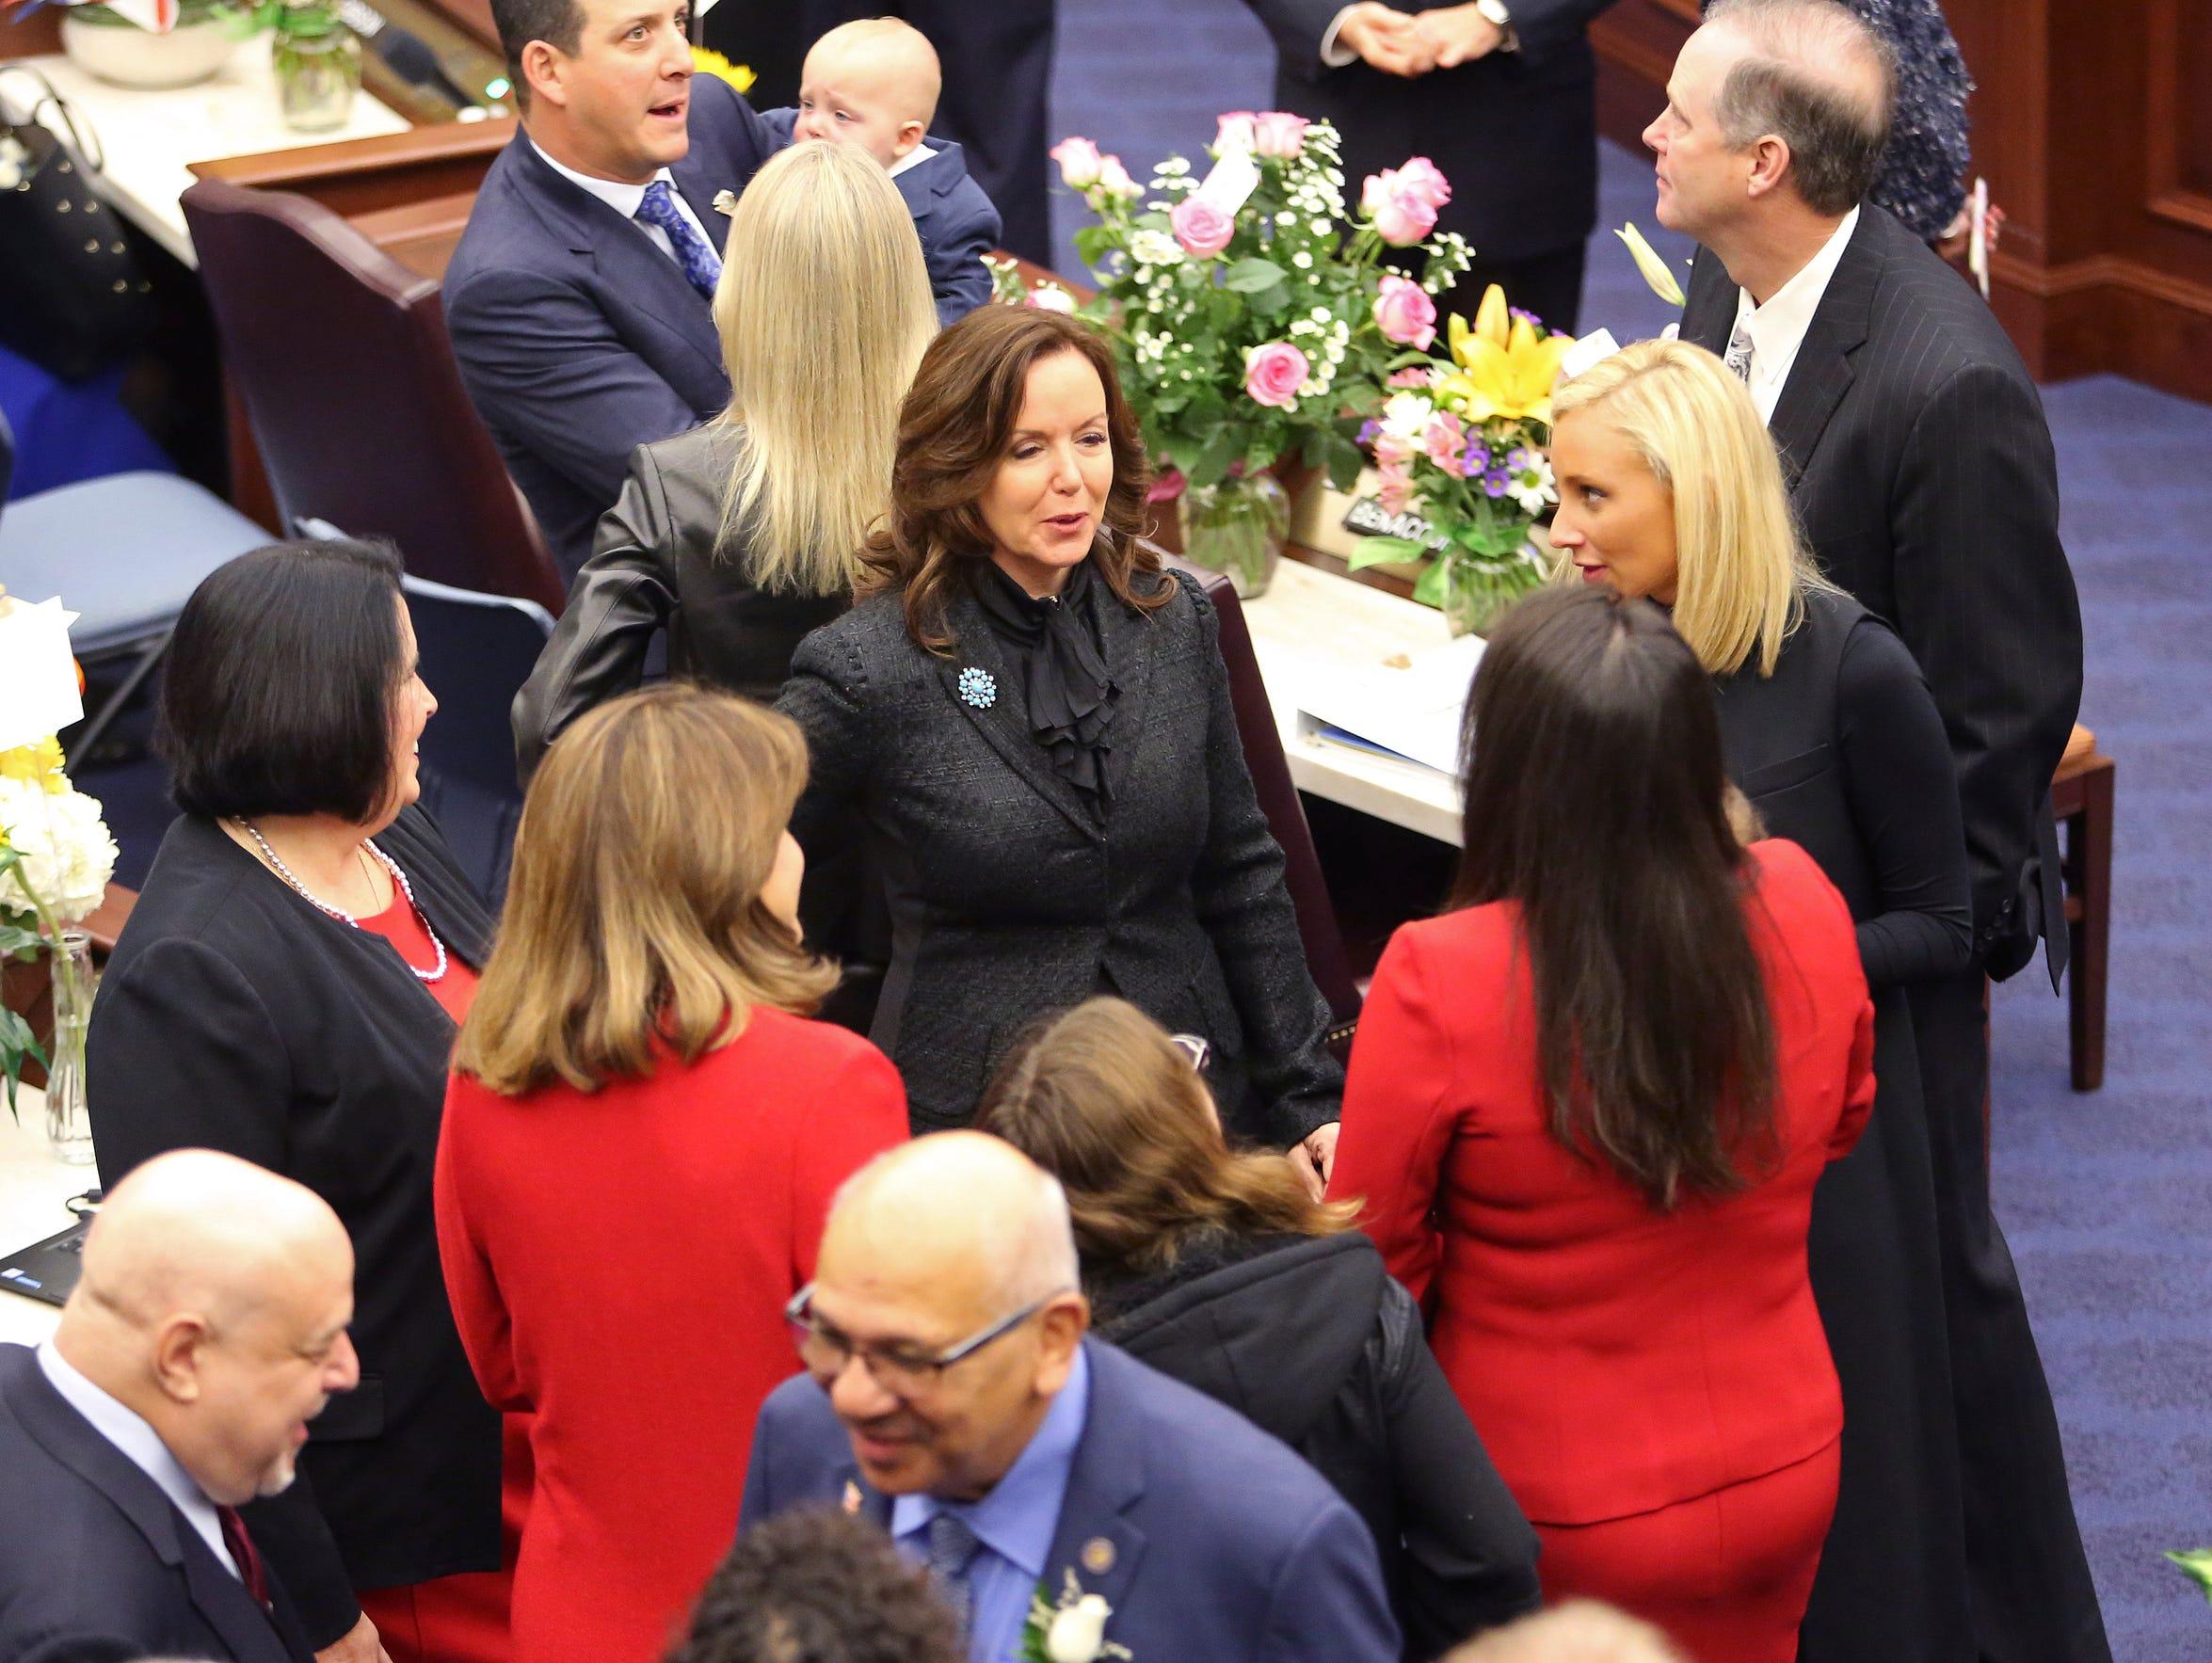 Florida senators meet and greet each other on the floor